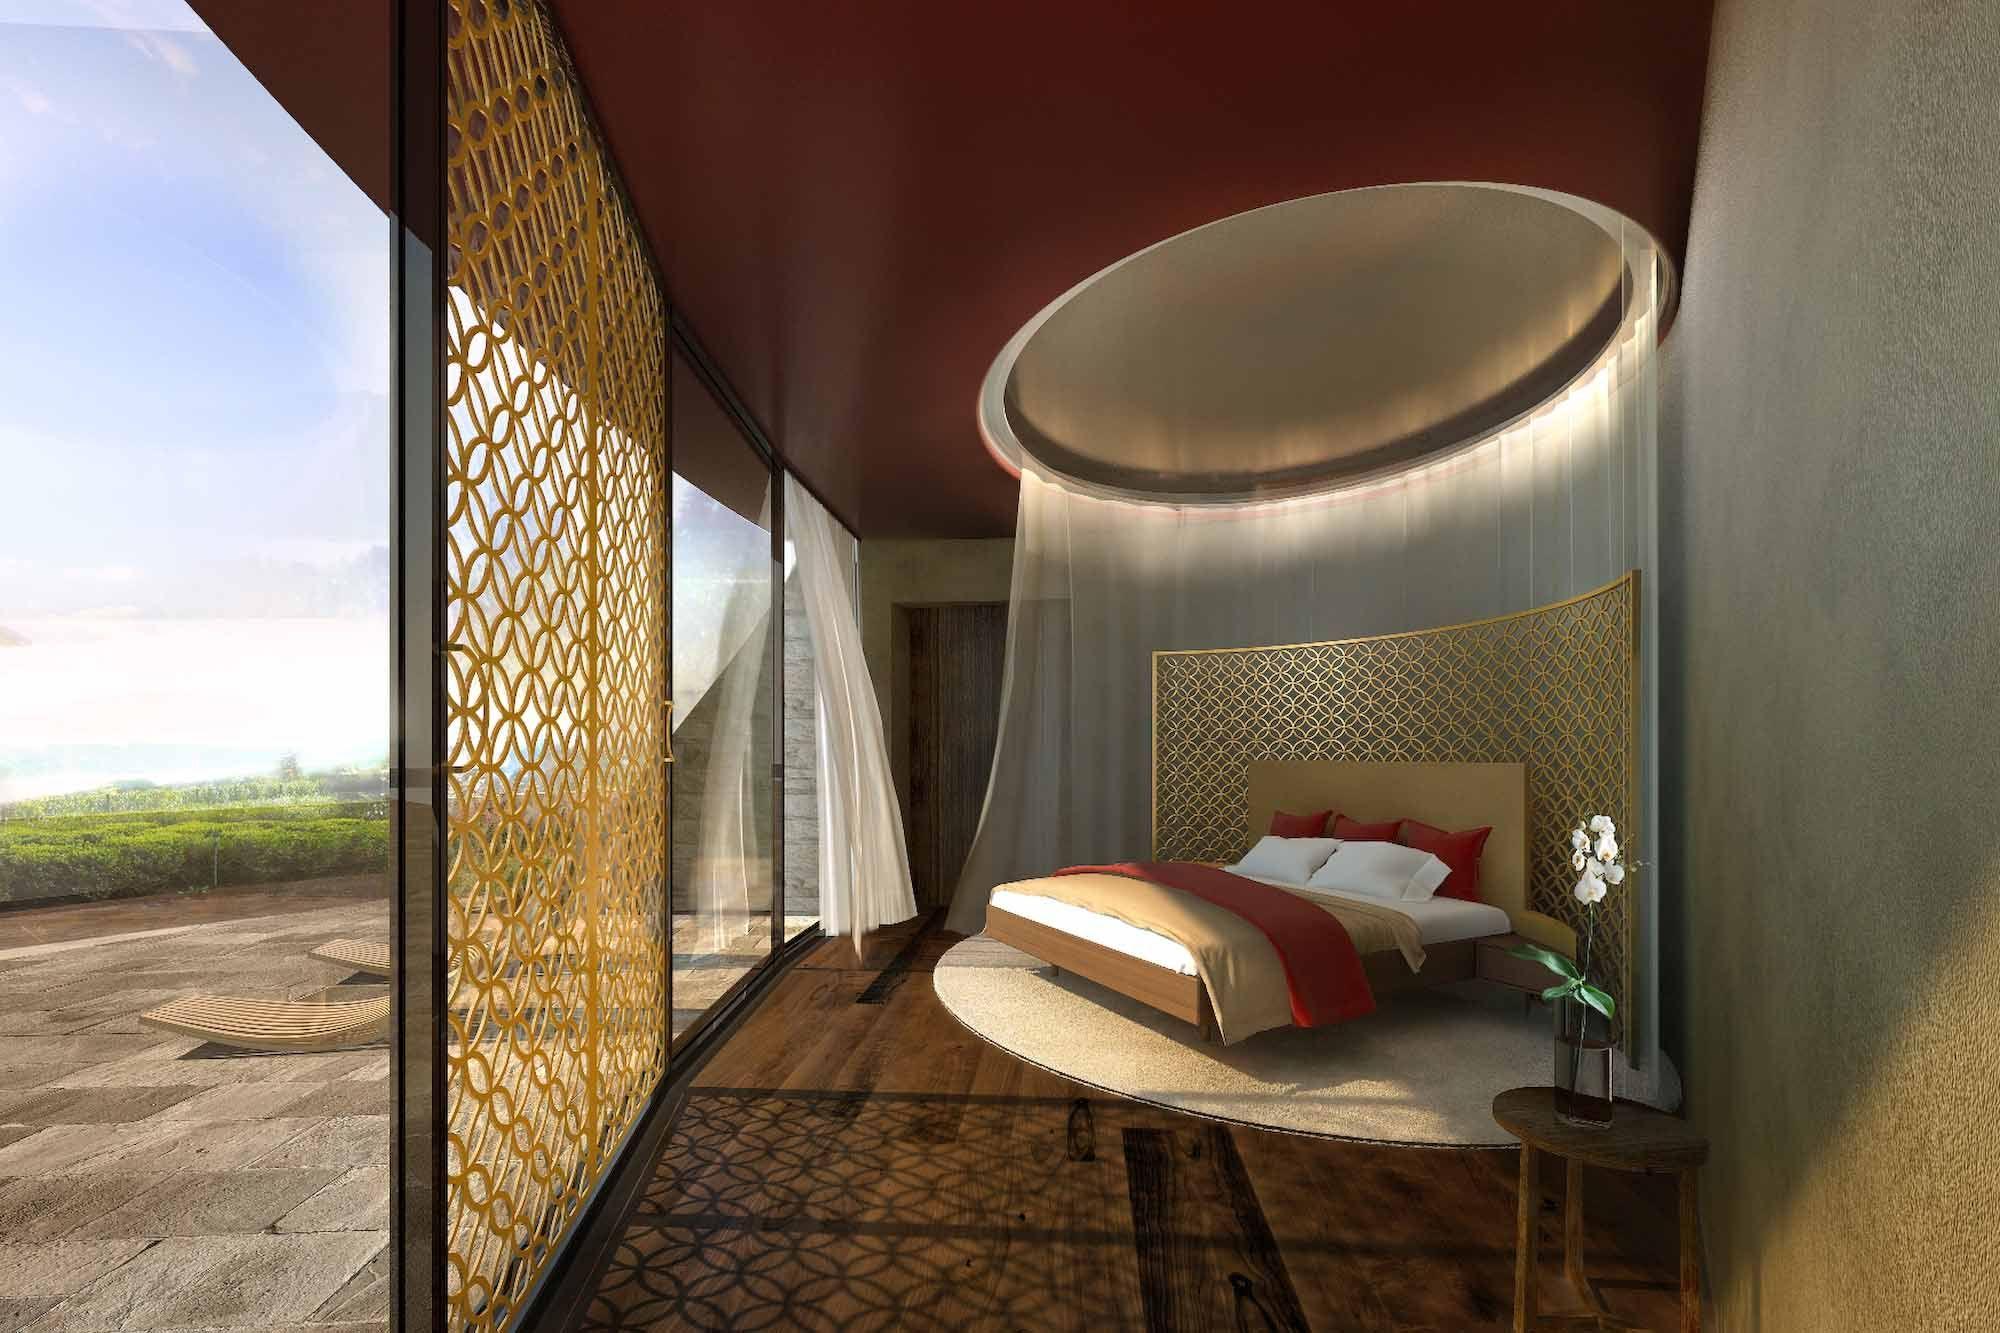 Suites In Terrazza Images - House Design Ideas 2018 - gunsho.us